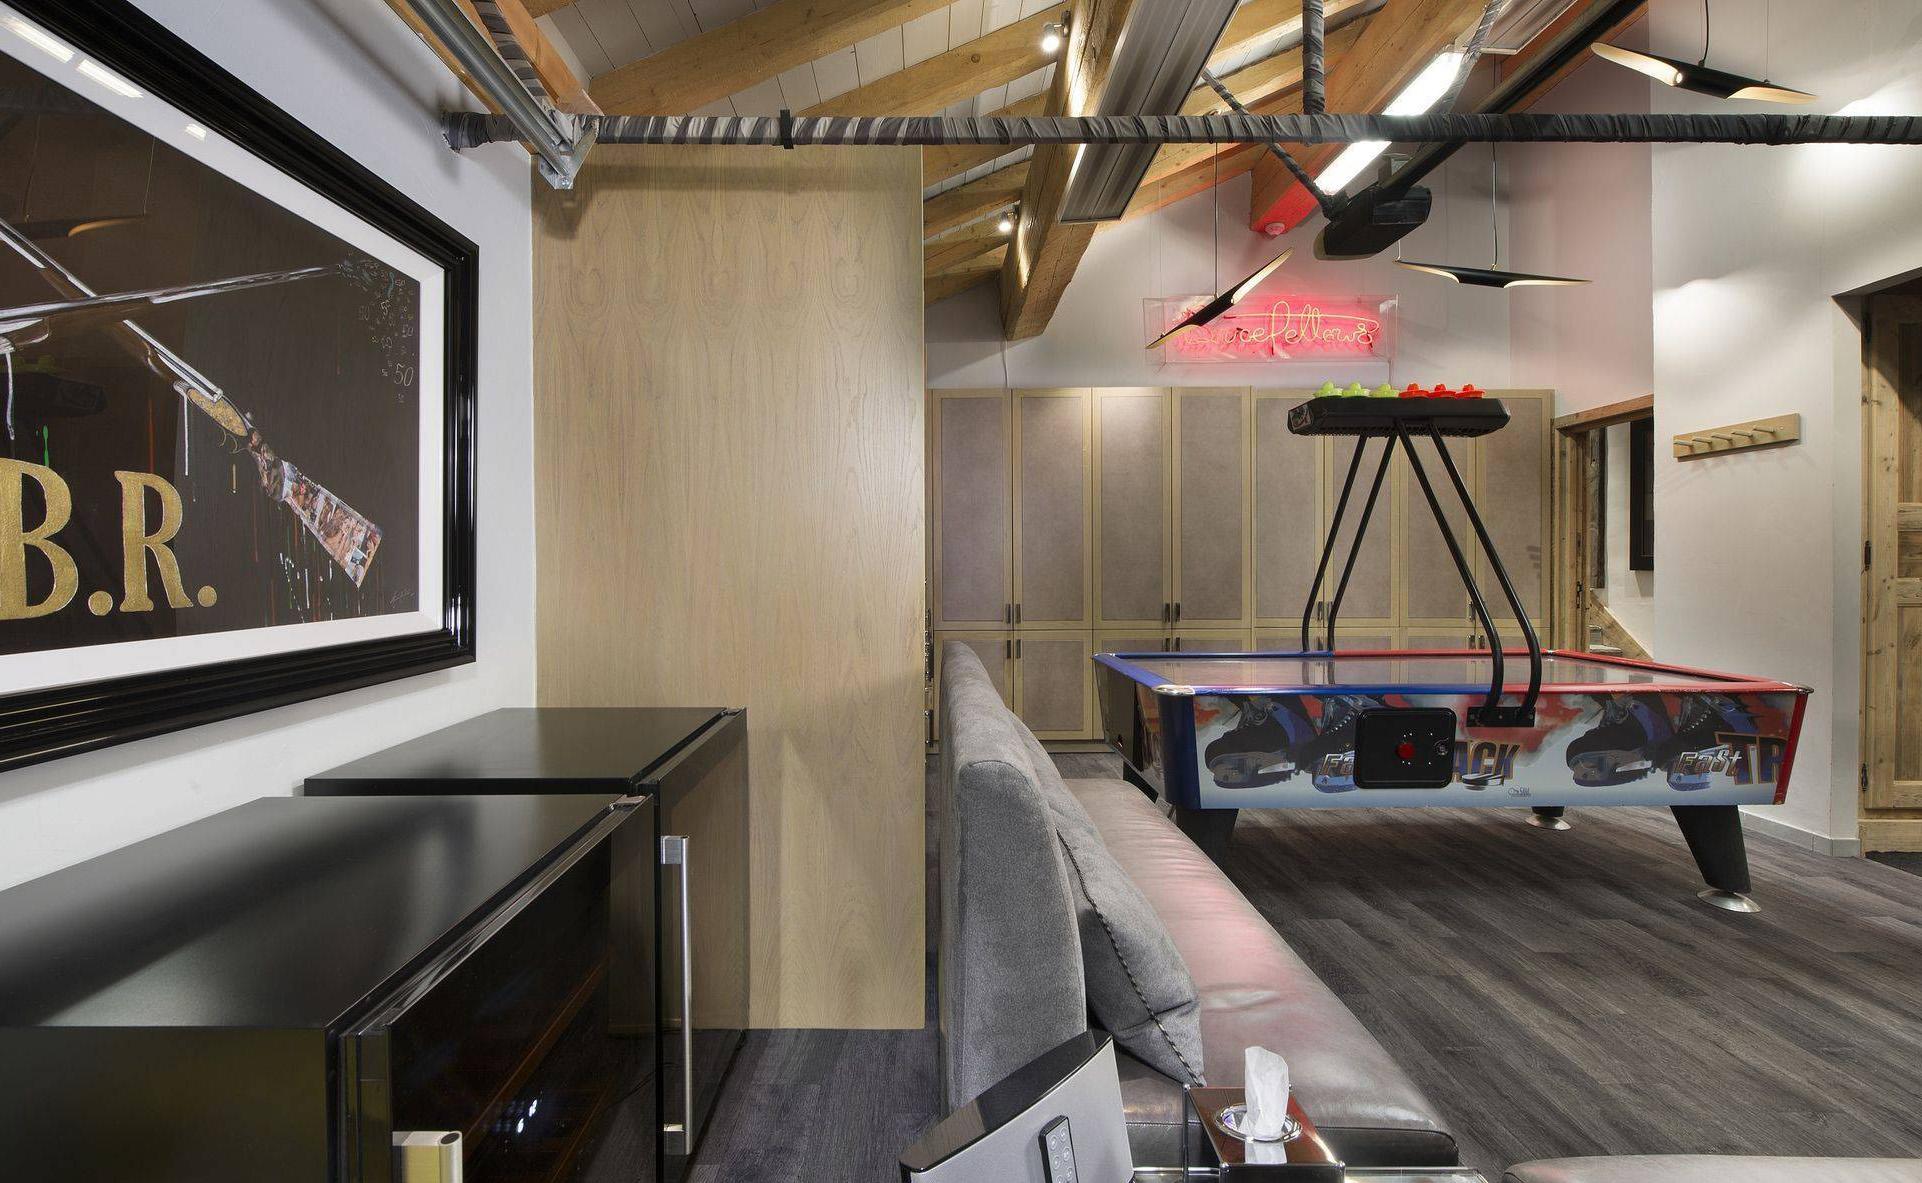 Lovelydays luxury service apartment rental - Courchevel - Great Roc Chalet - Partner - 7 bedrooms - 6 bathrooms - Children toys - 26102e4db340 - Lovelydays